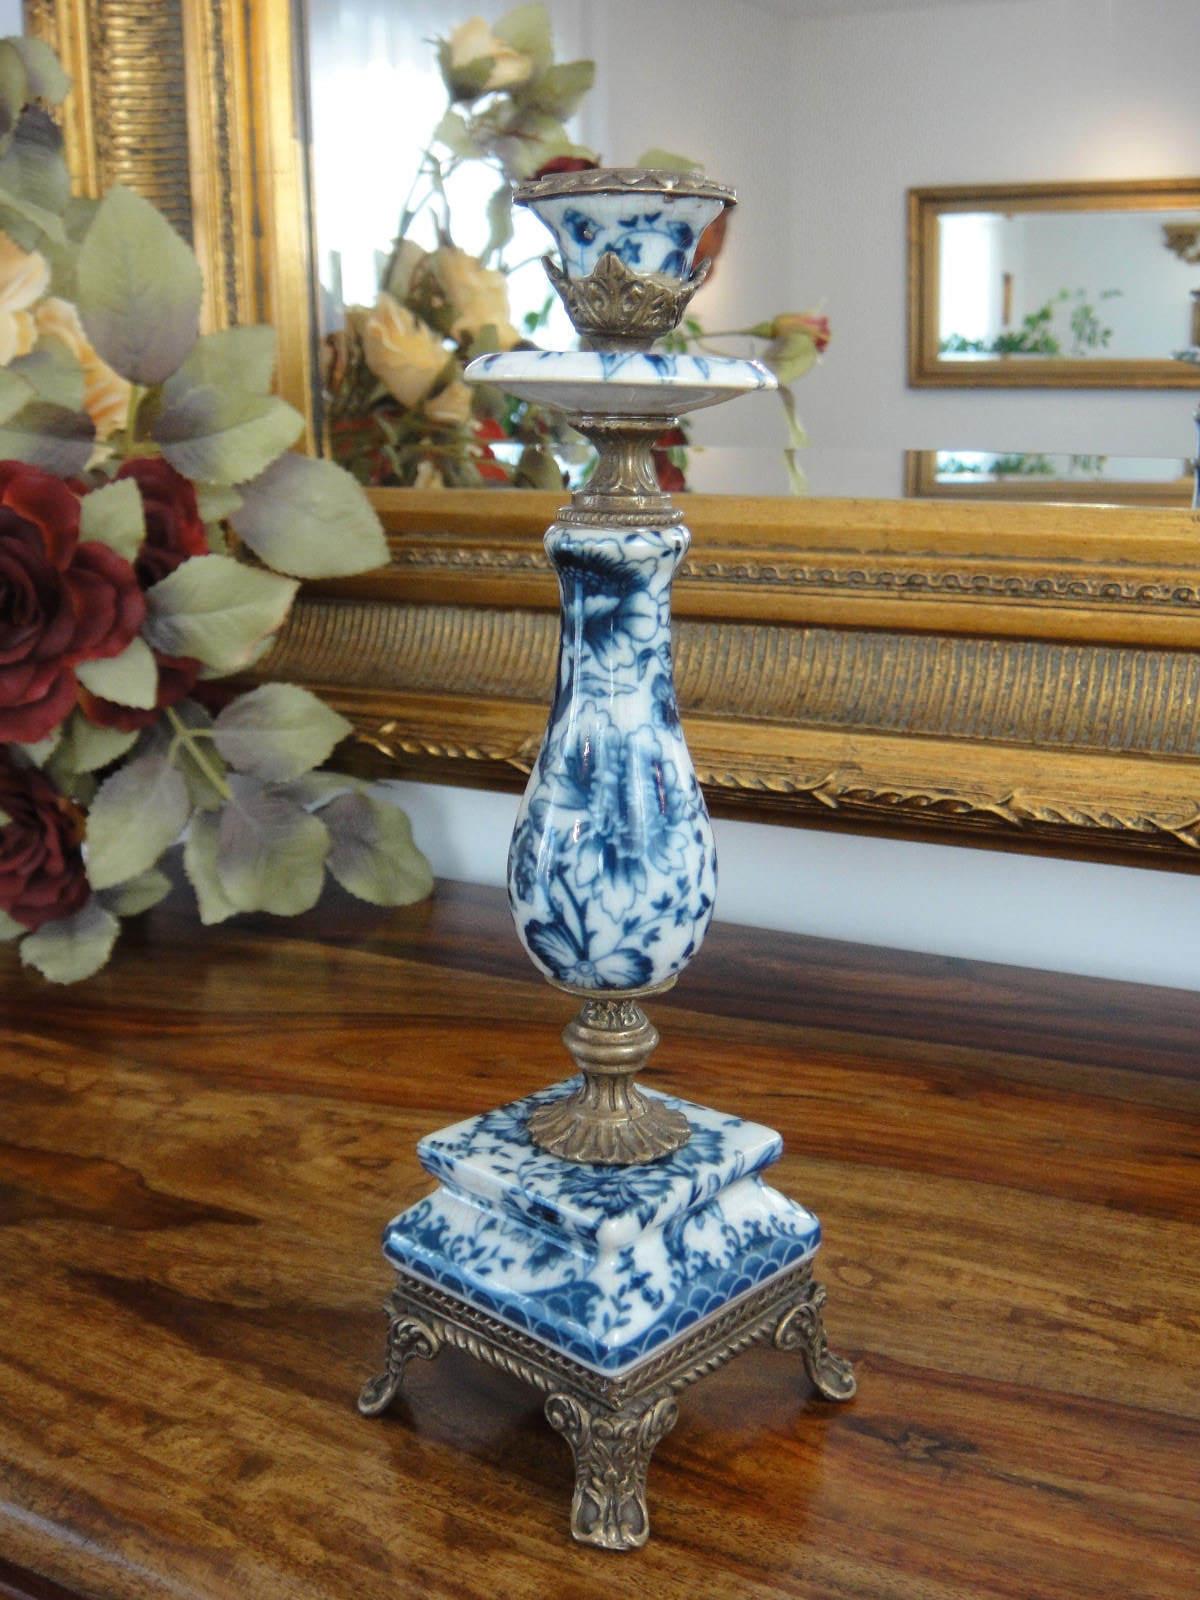 Lujo candiles porcelana bronce candeleros candelabro Antik Edel nuevo